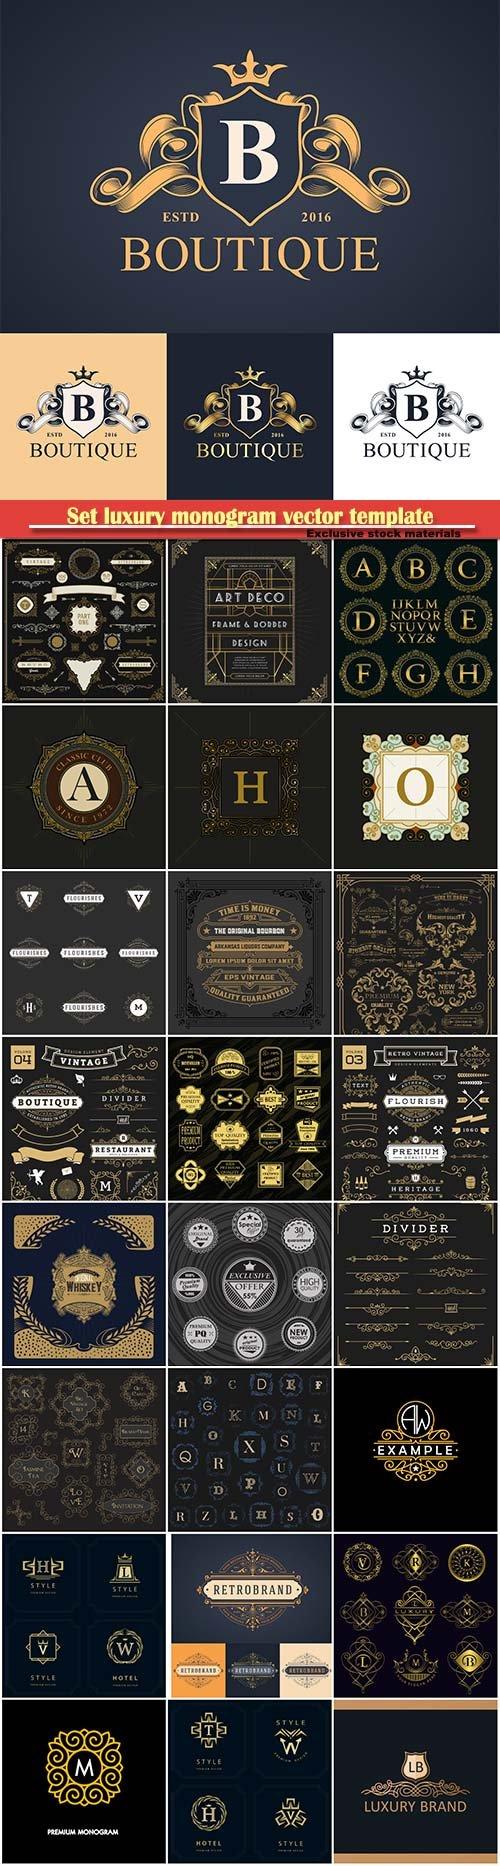 Set luxury monogram vector template, logos, badges, symbols # 11